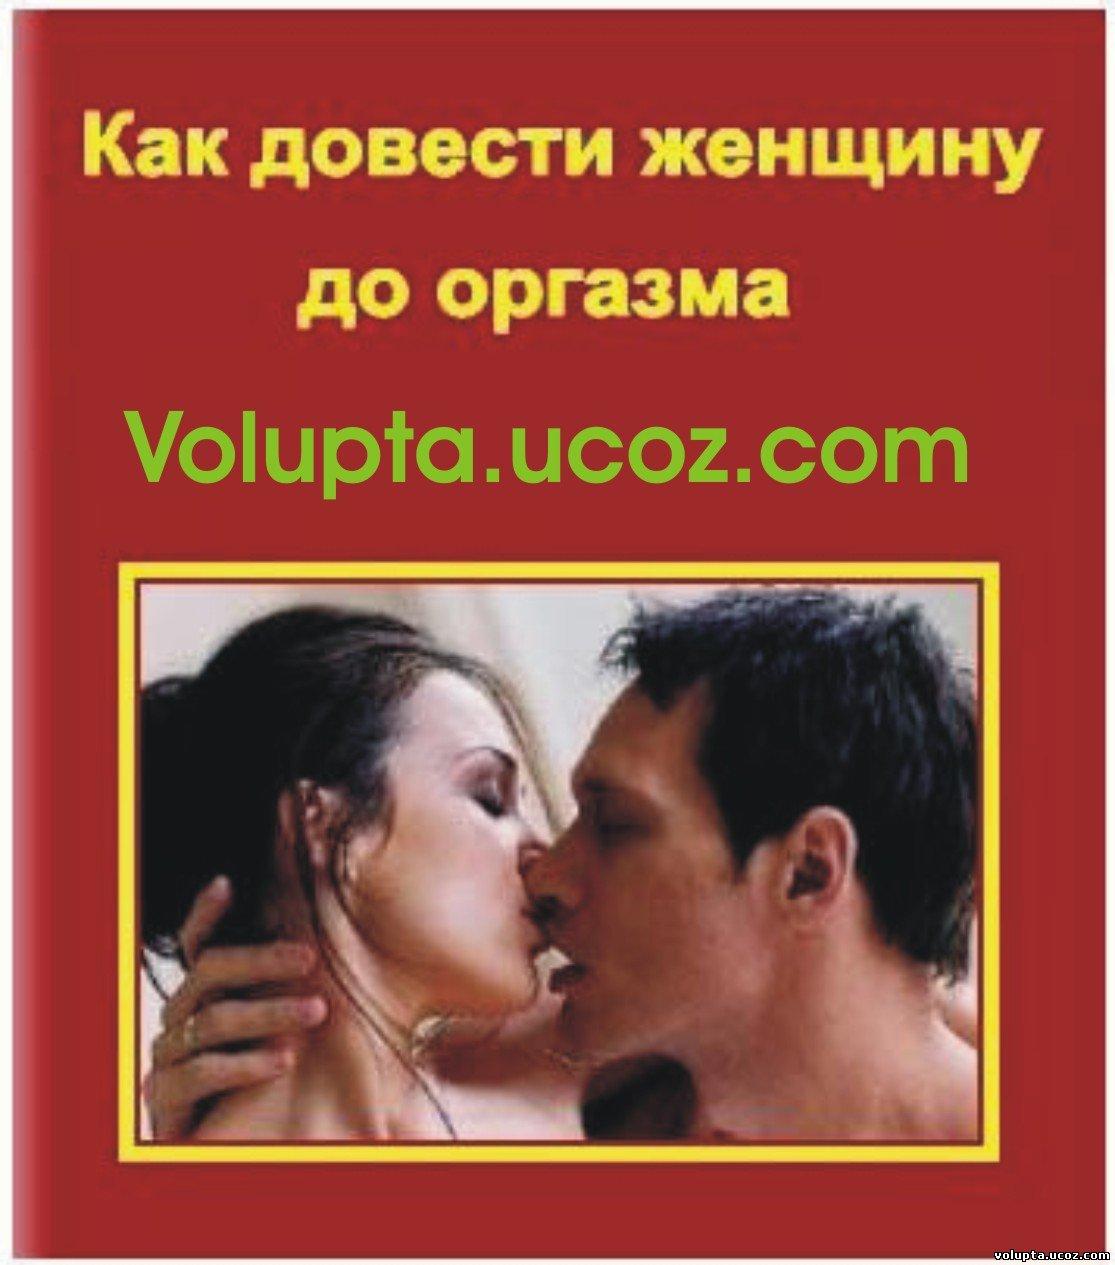 Оргазм послушать онлайн 330